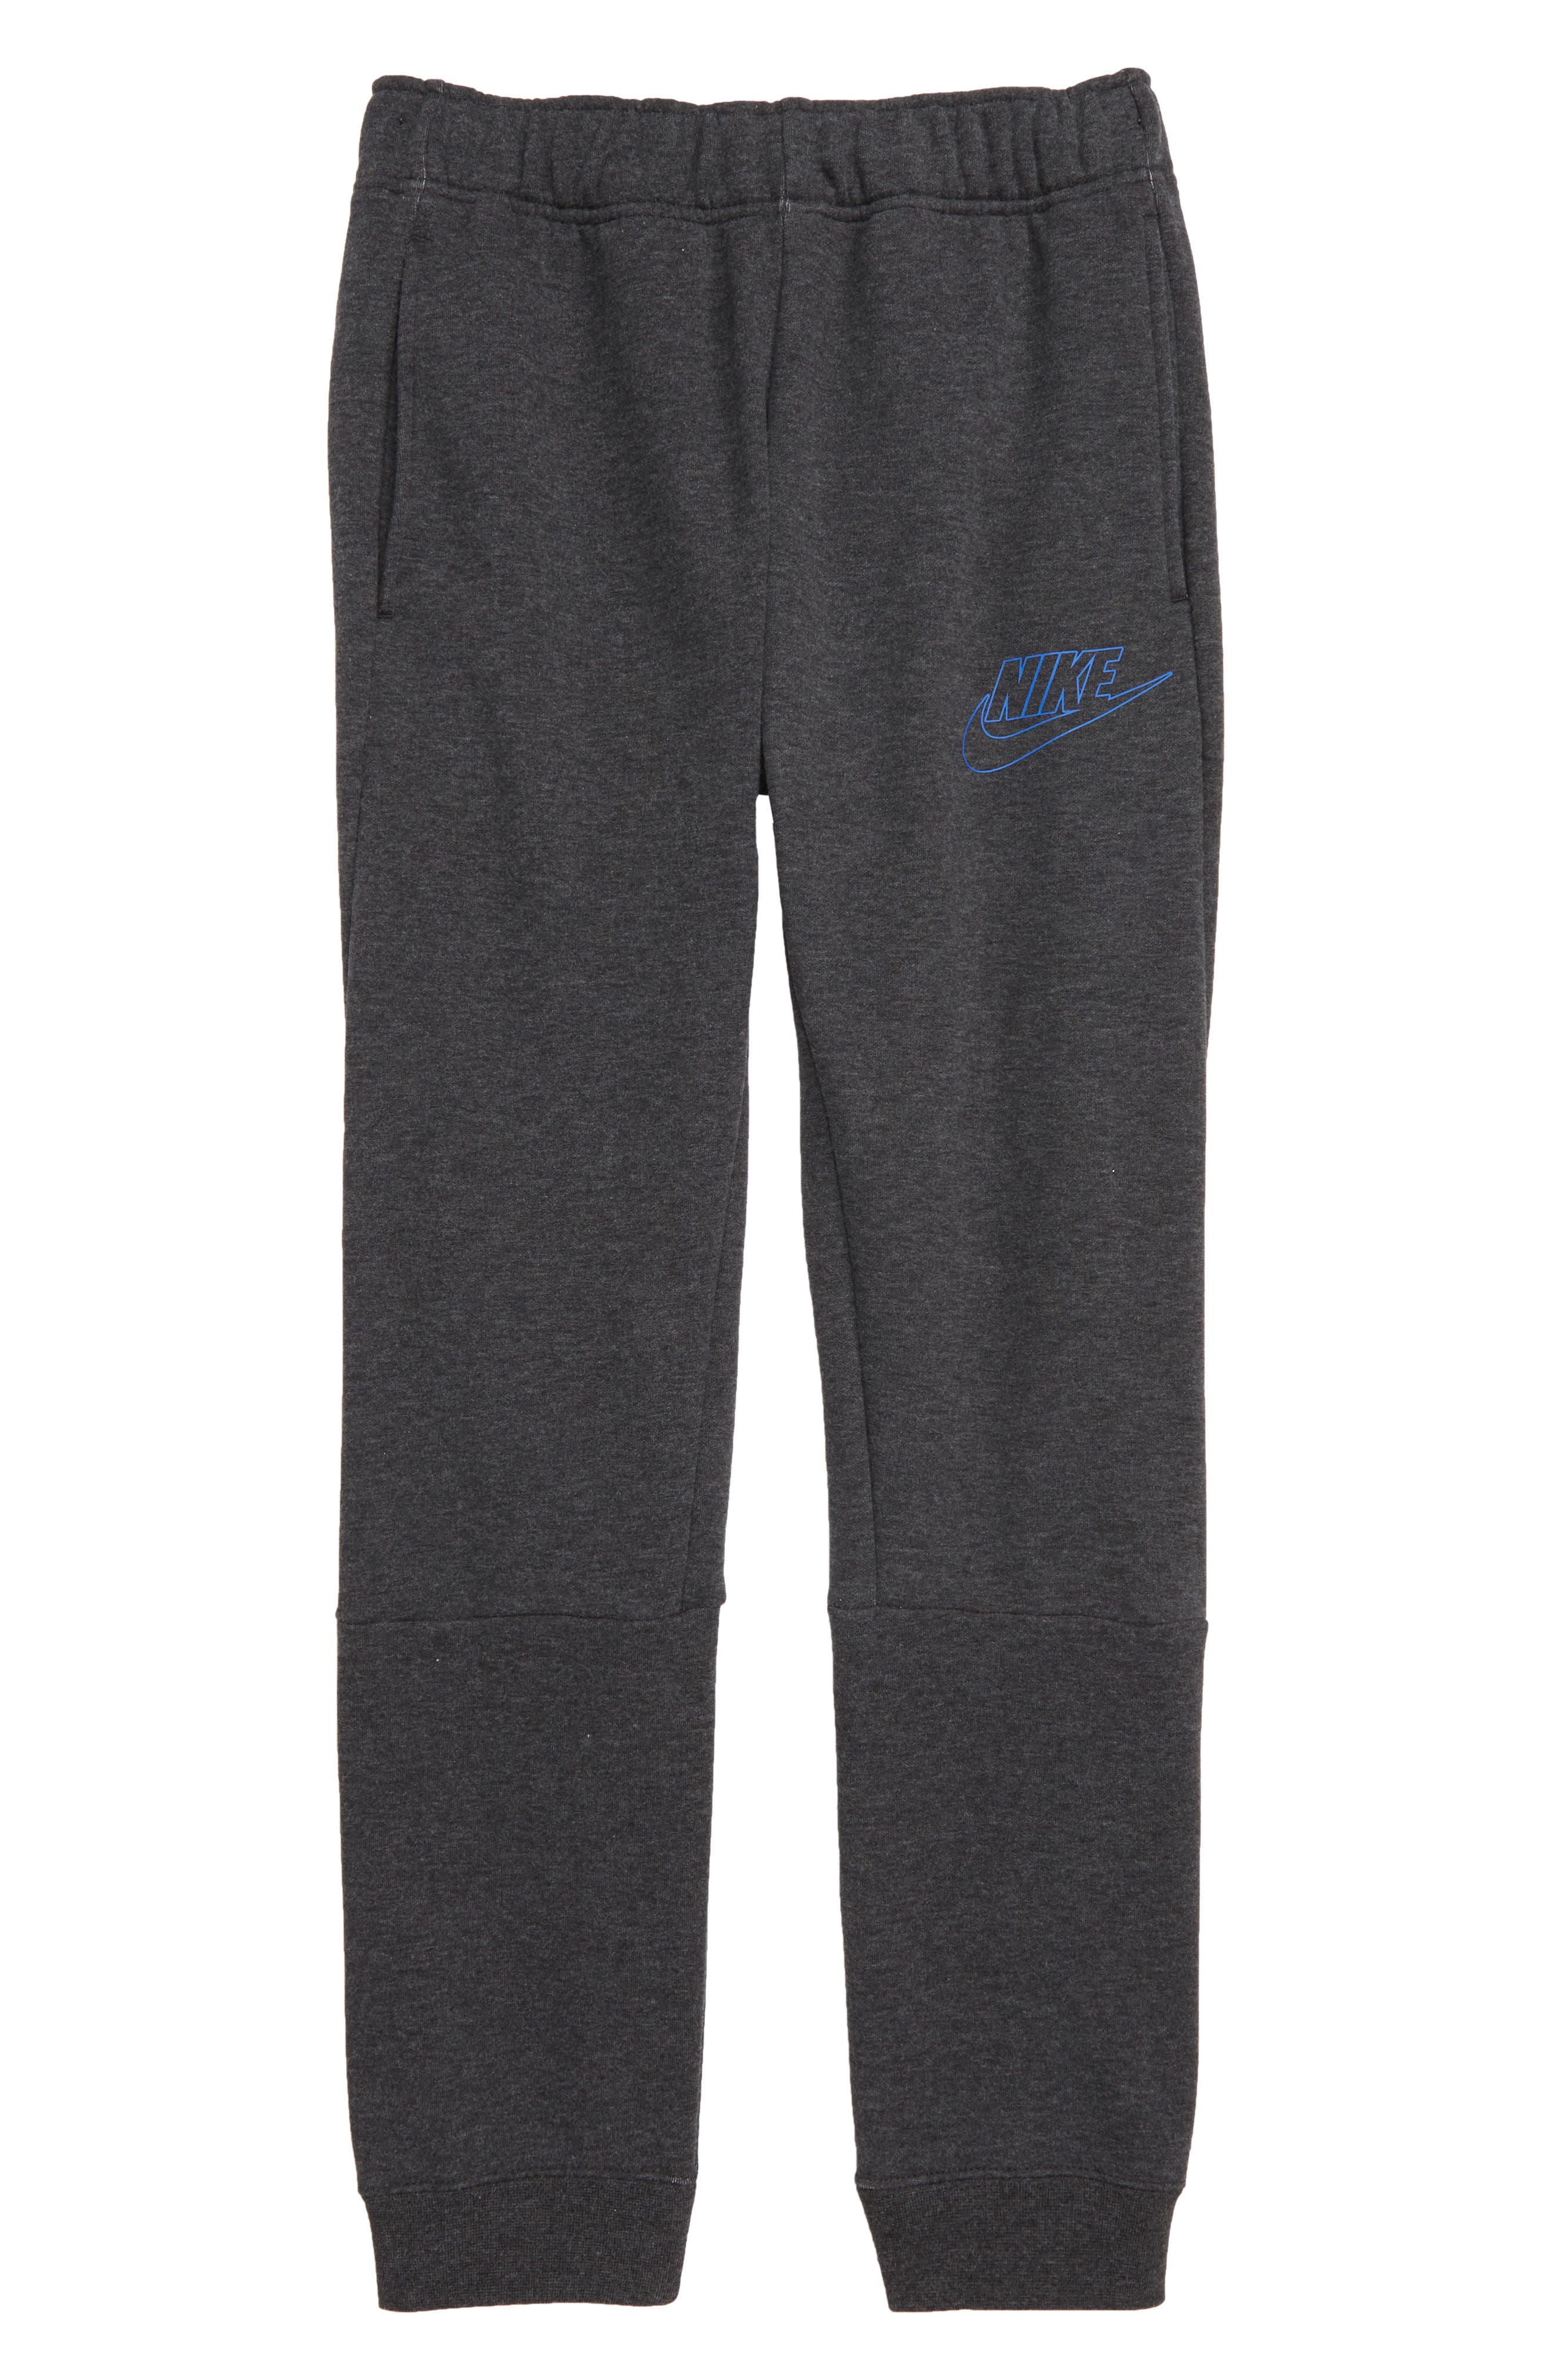 Sportswear My Nike Sweatpants,                         Main,                         color, BLACK HEATHER/ GAME ROYAL